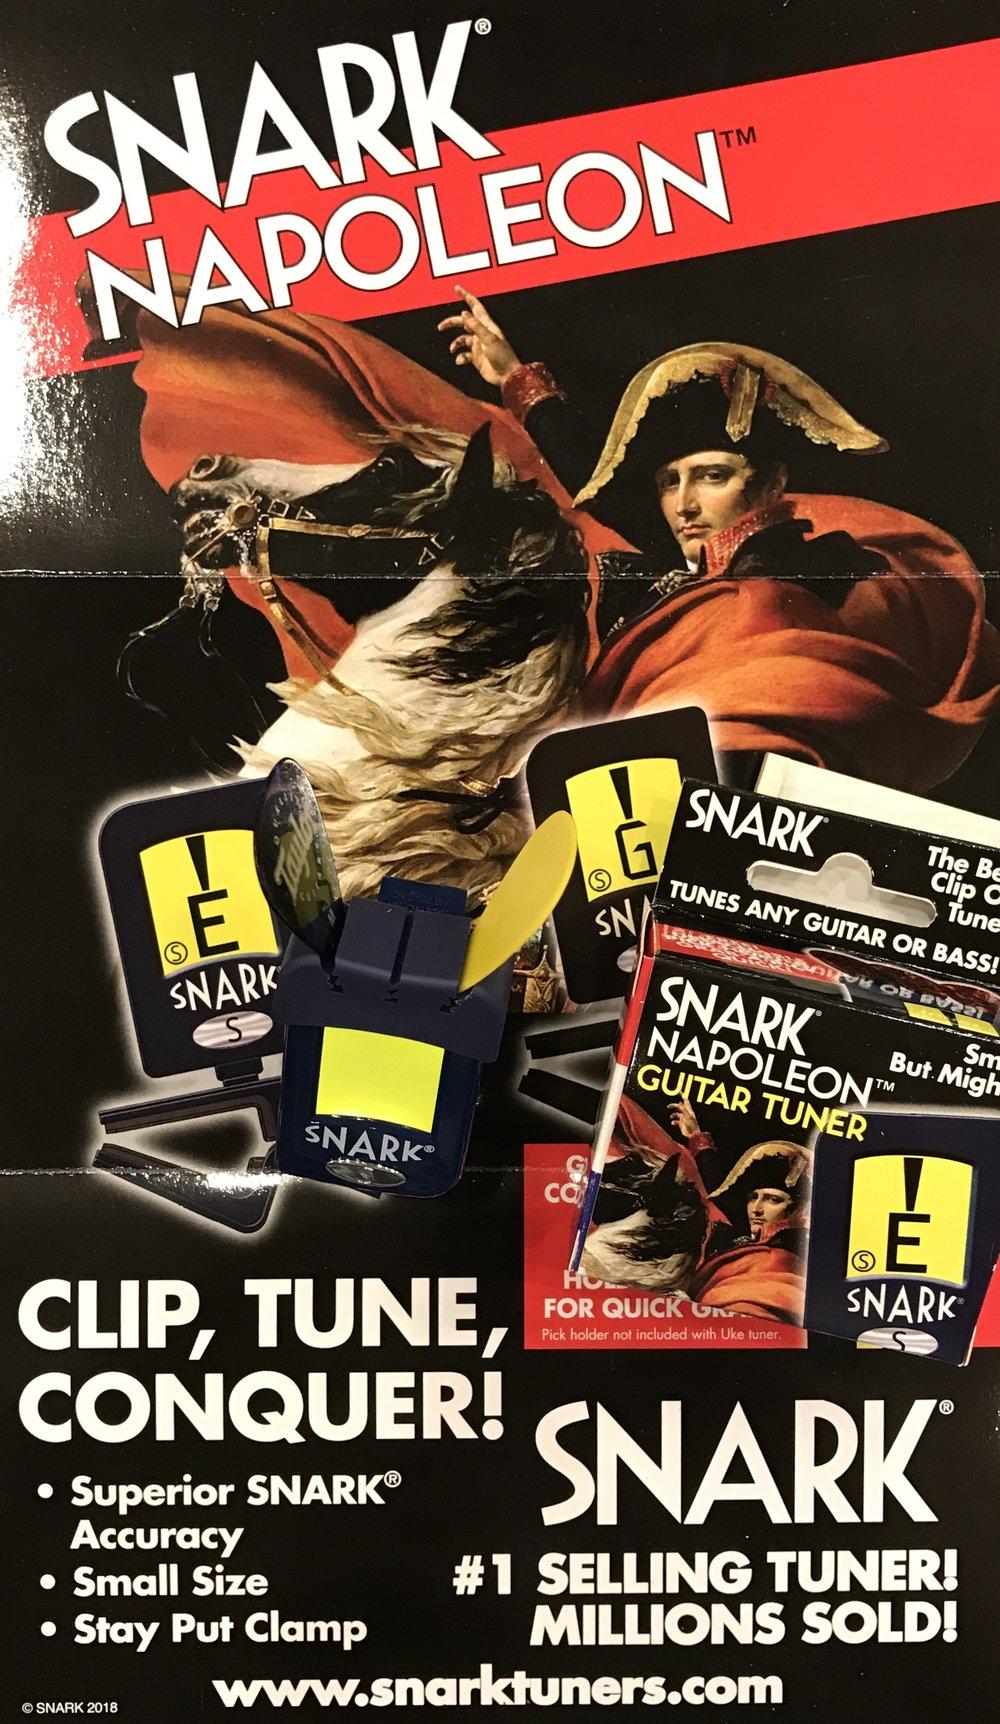 Snark® Napoleon™ Tuners